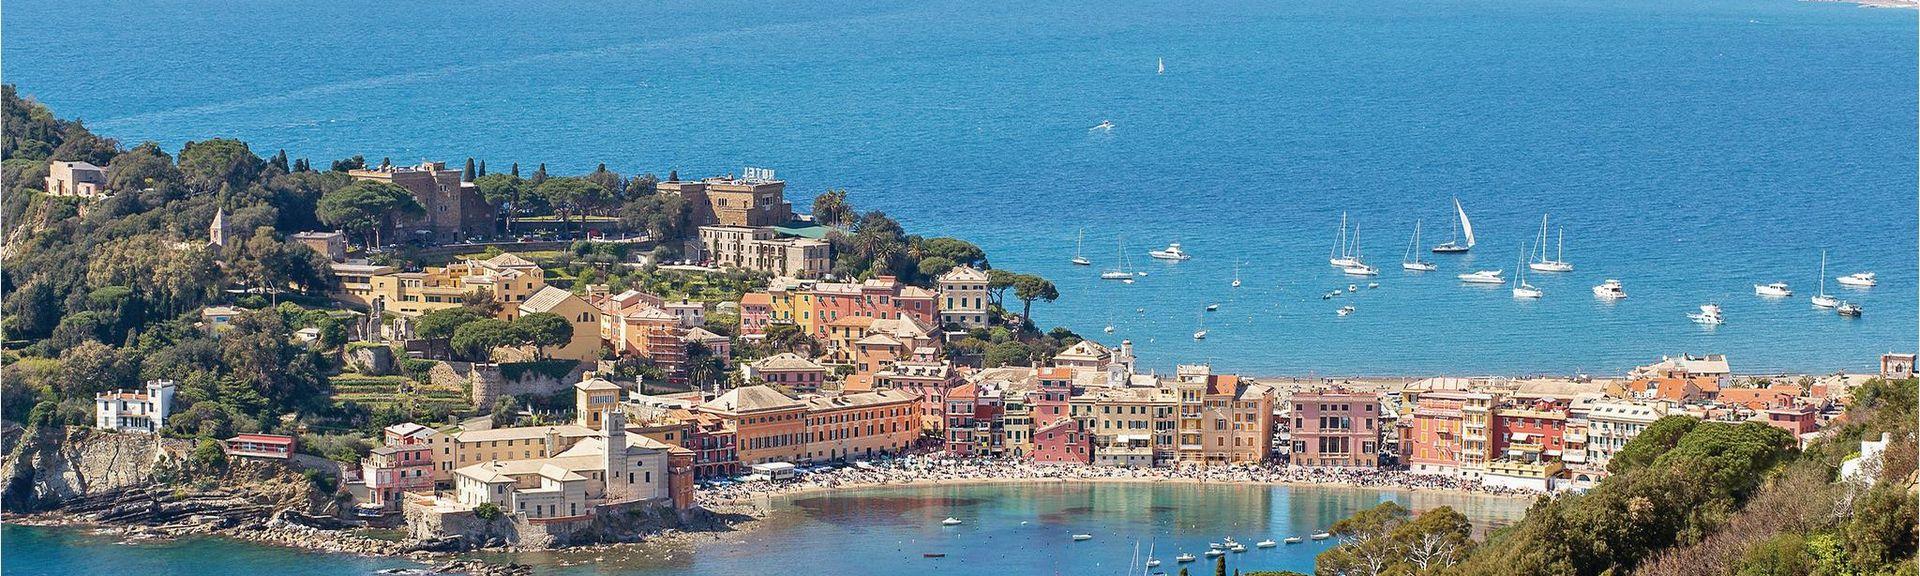 Montebruno, Metropolitan City of Genoa, Liguria, Italy